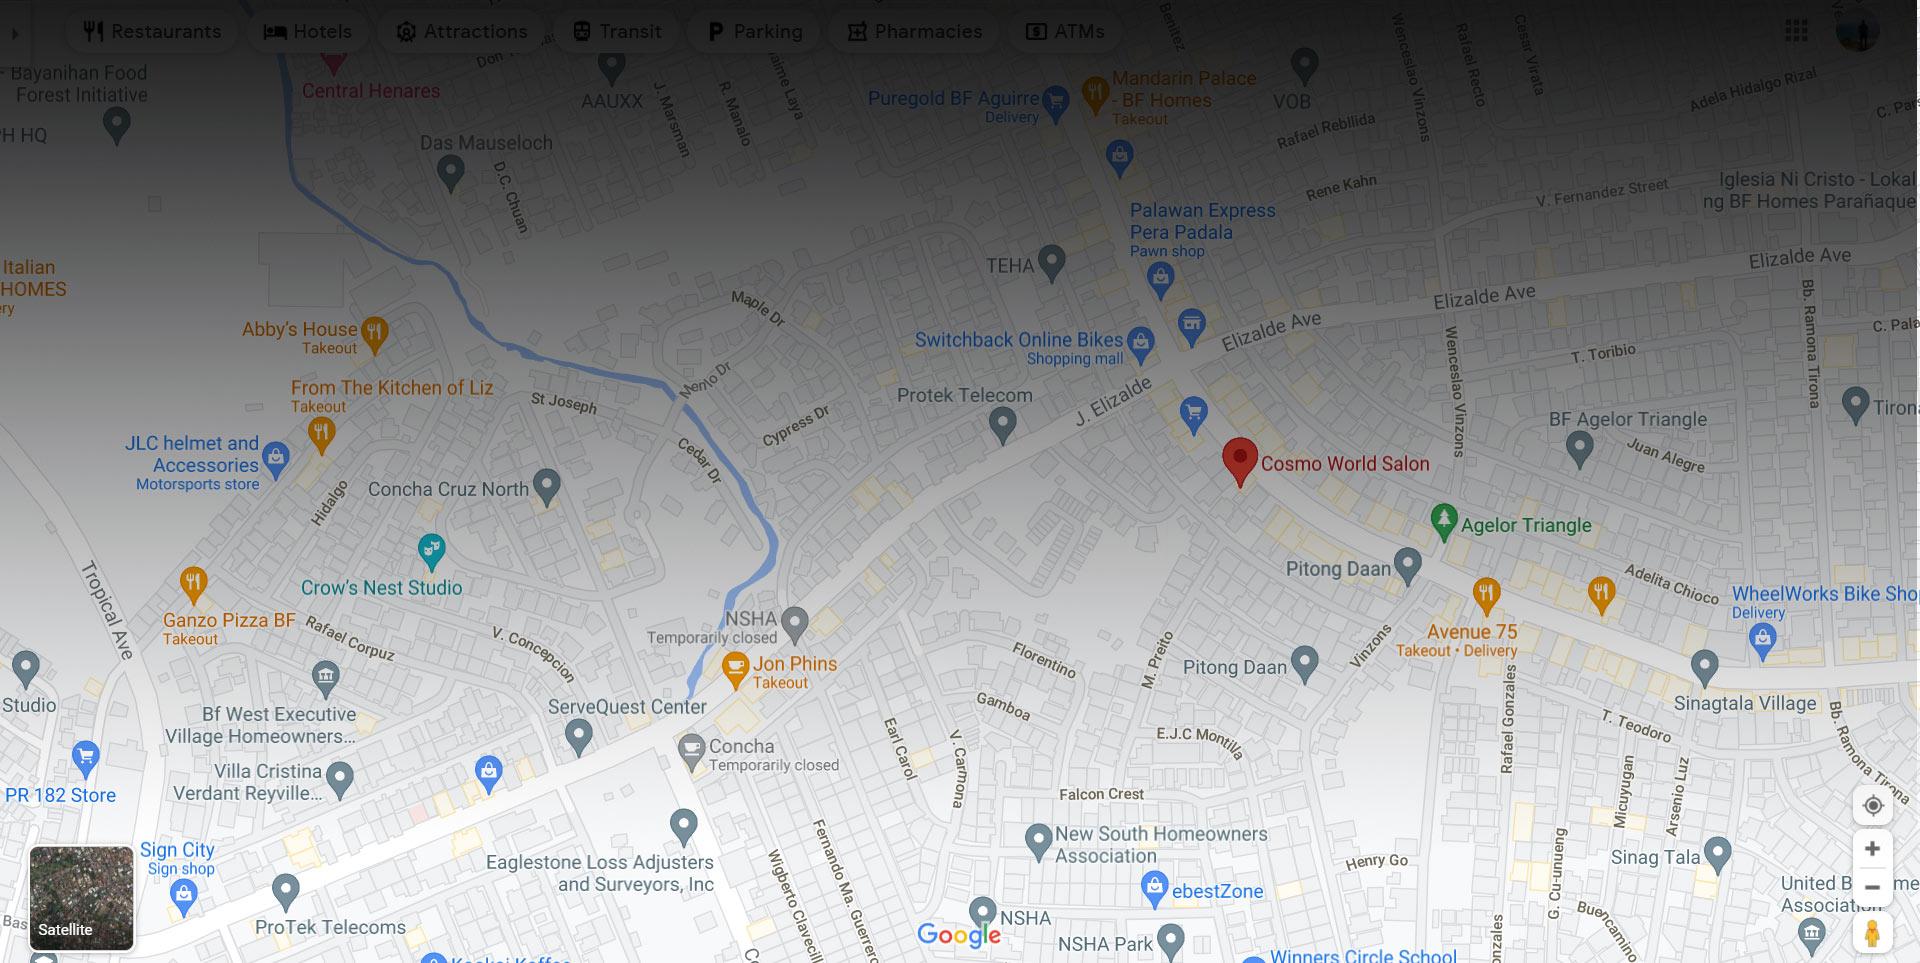 cosmoworld salon map